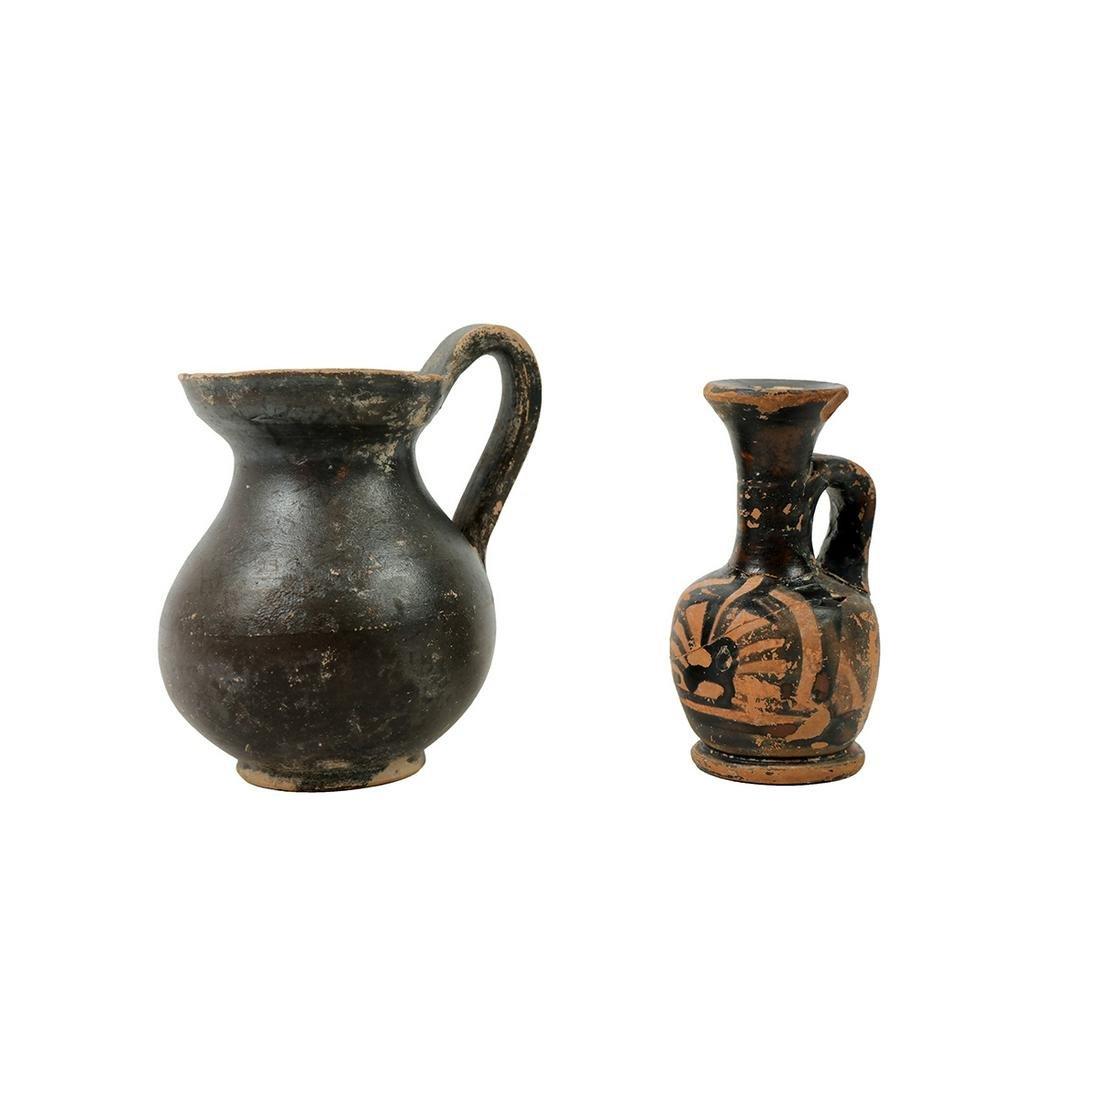 Lot of 2 Ancient Greek Apulian Pottery Vessels c.4th